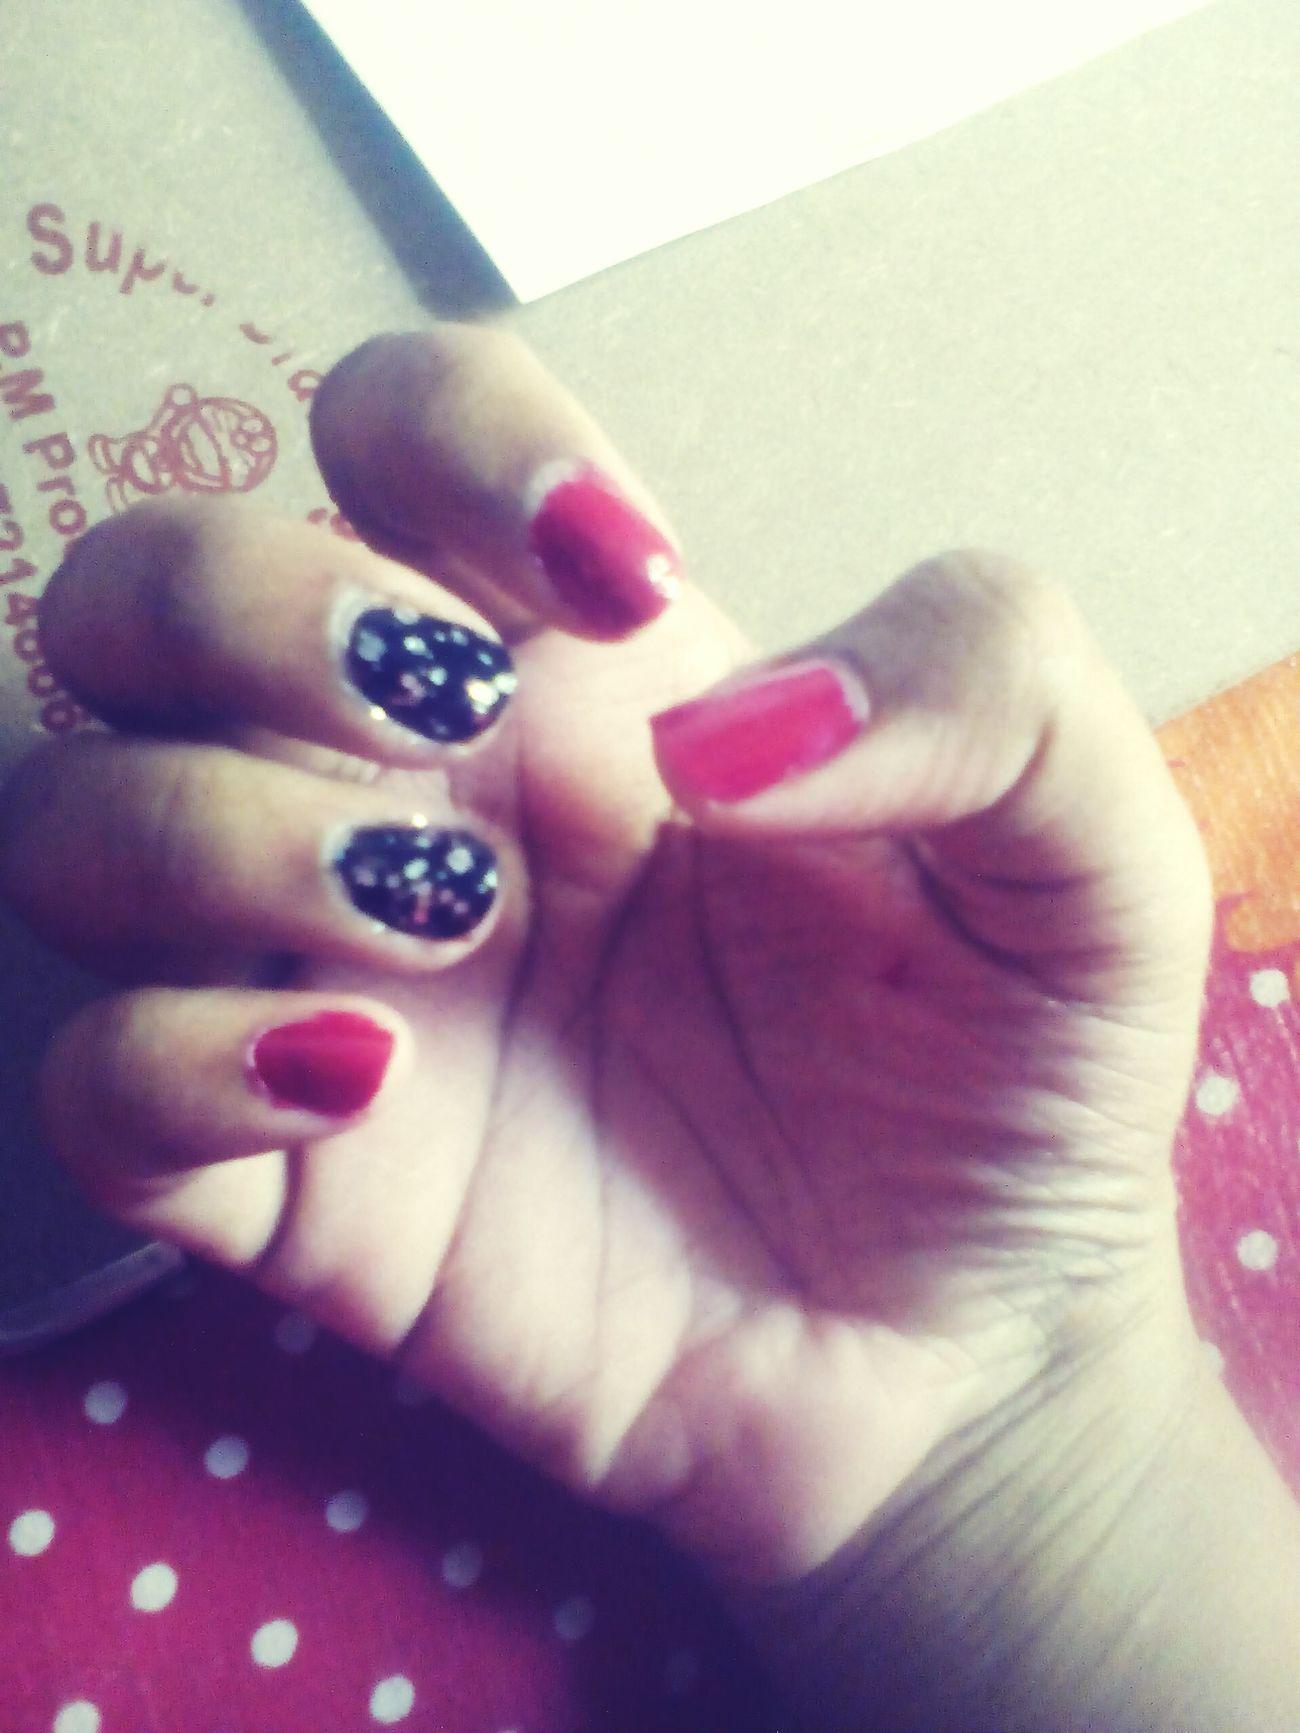 Nailart  Nails <3 Love My Nails ❤ Nailarts Nailpolish💅 Nailpolishaddict Nailpolishswag Red Black Whiteglitter